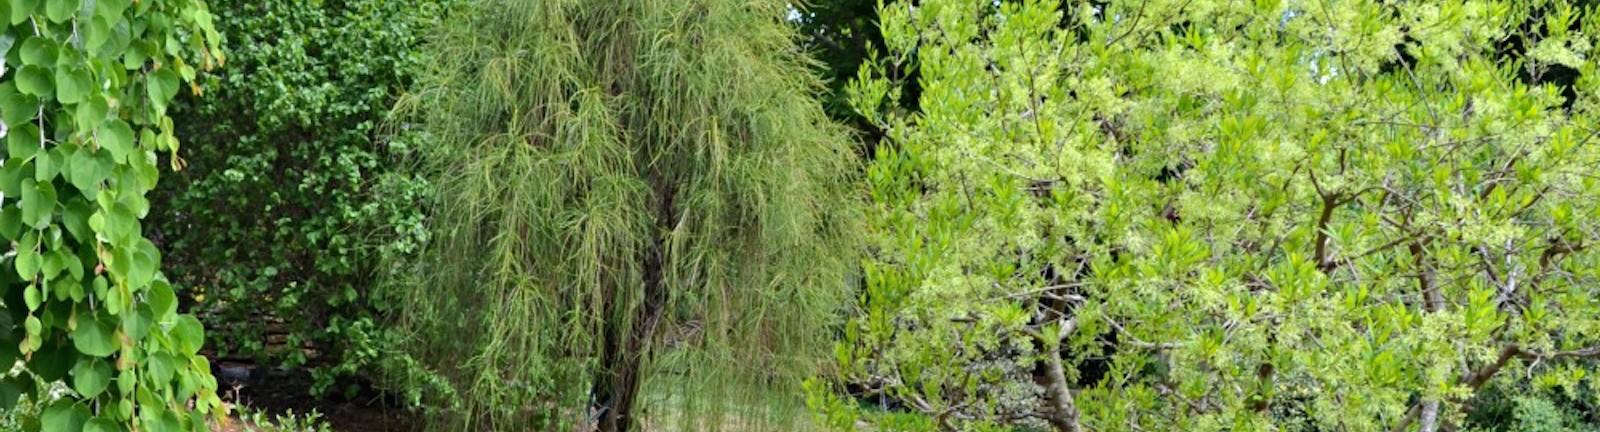 Tree Amp Shrubs Nursery Raleigh Nc Fairview Garden Center